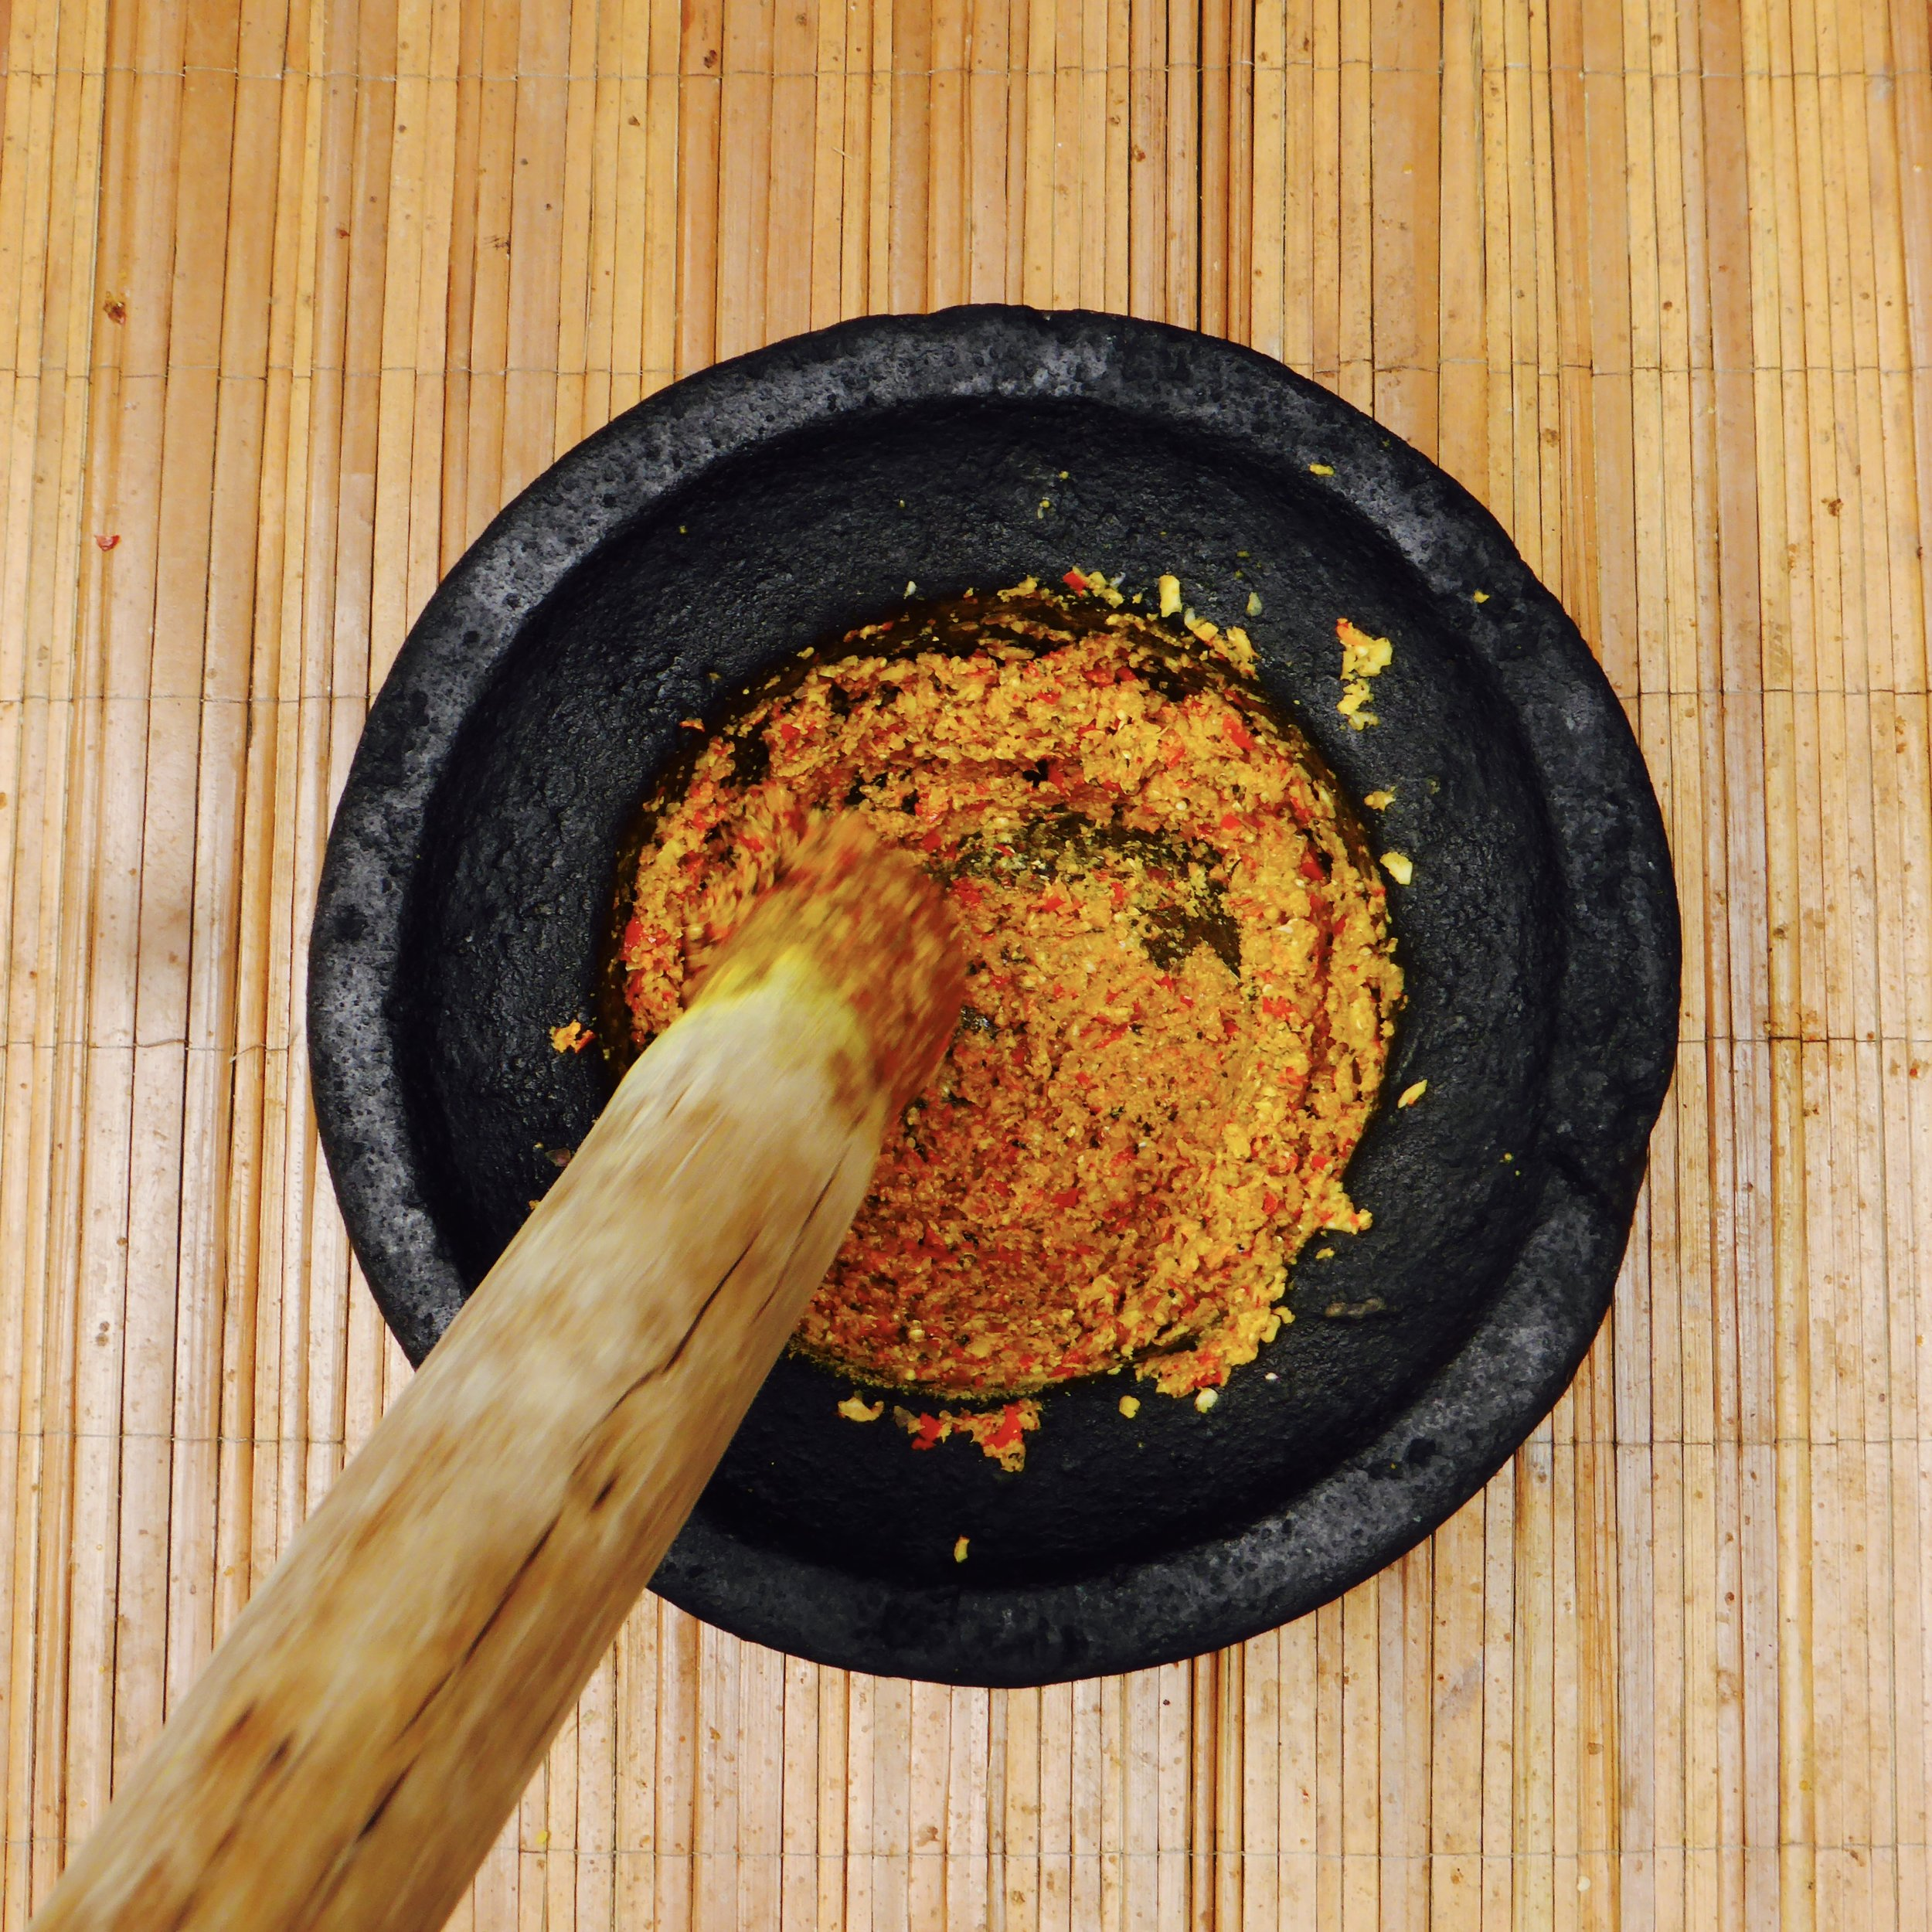 'Bali Blender' Paon Bali cooking class, near Ubud, @acrosslandsea